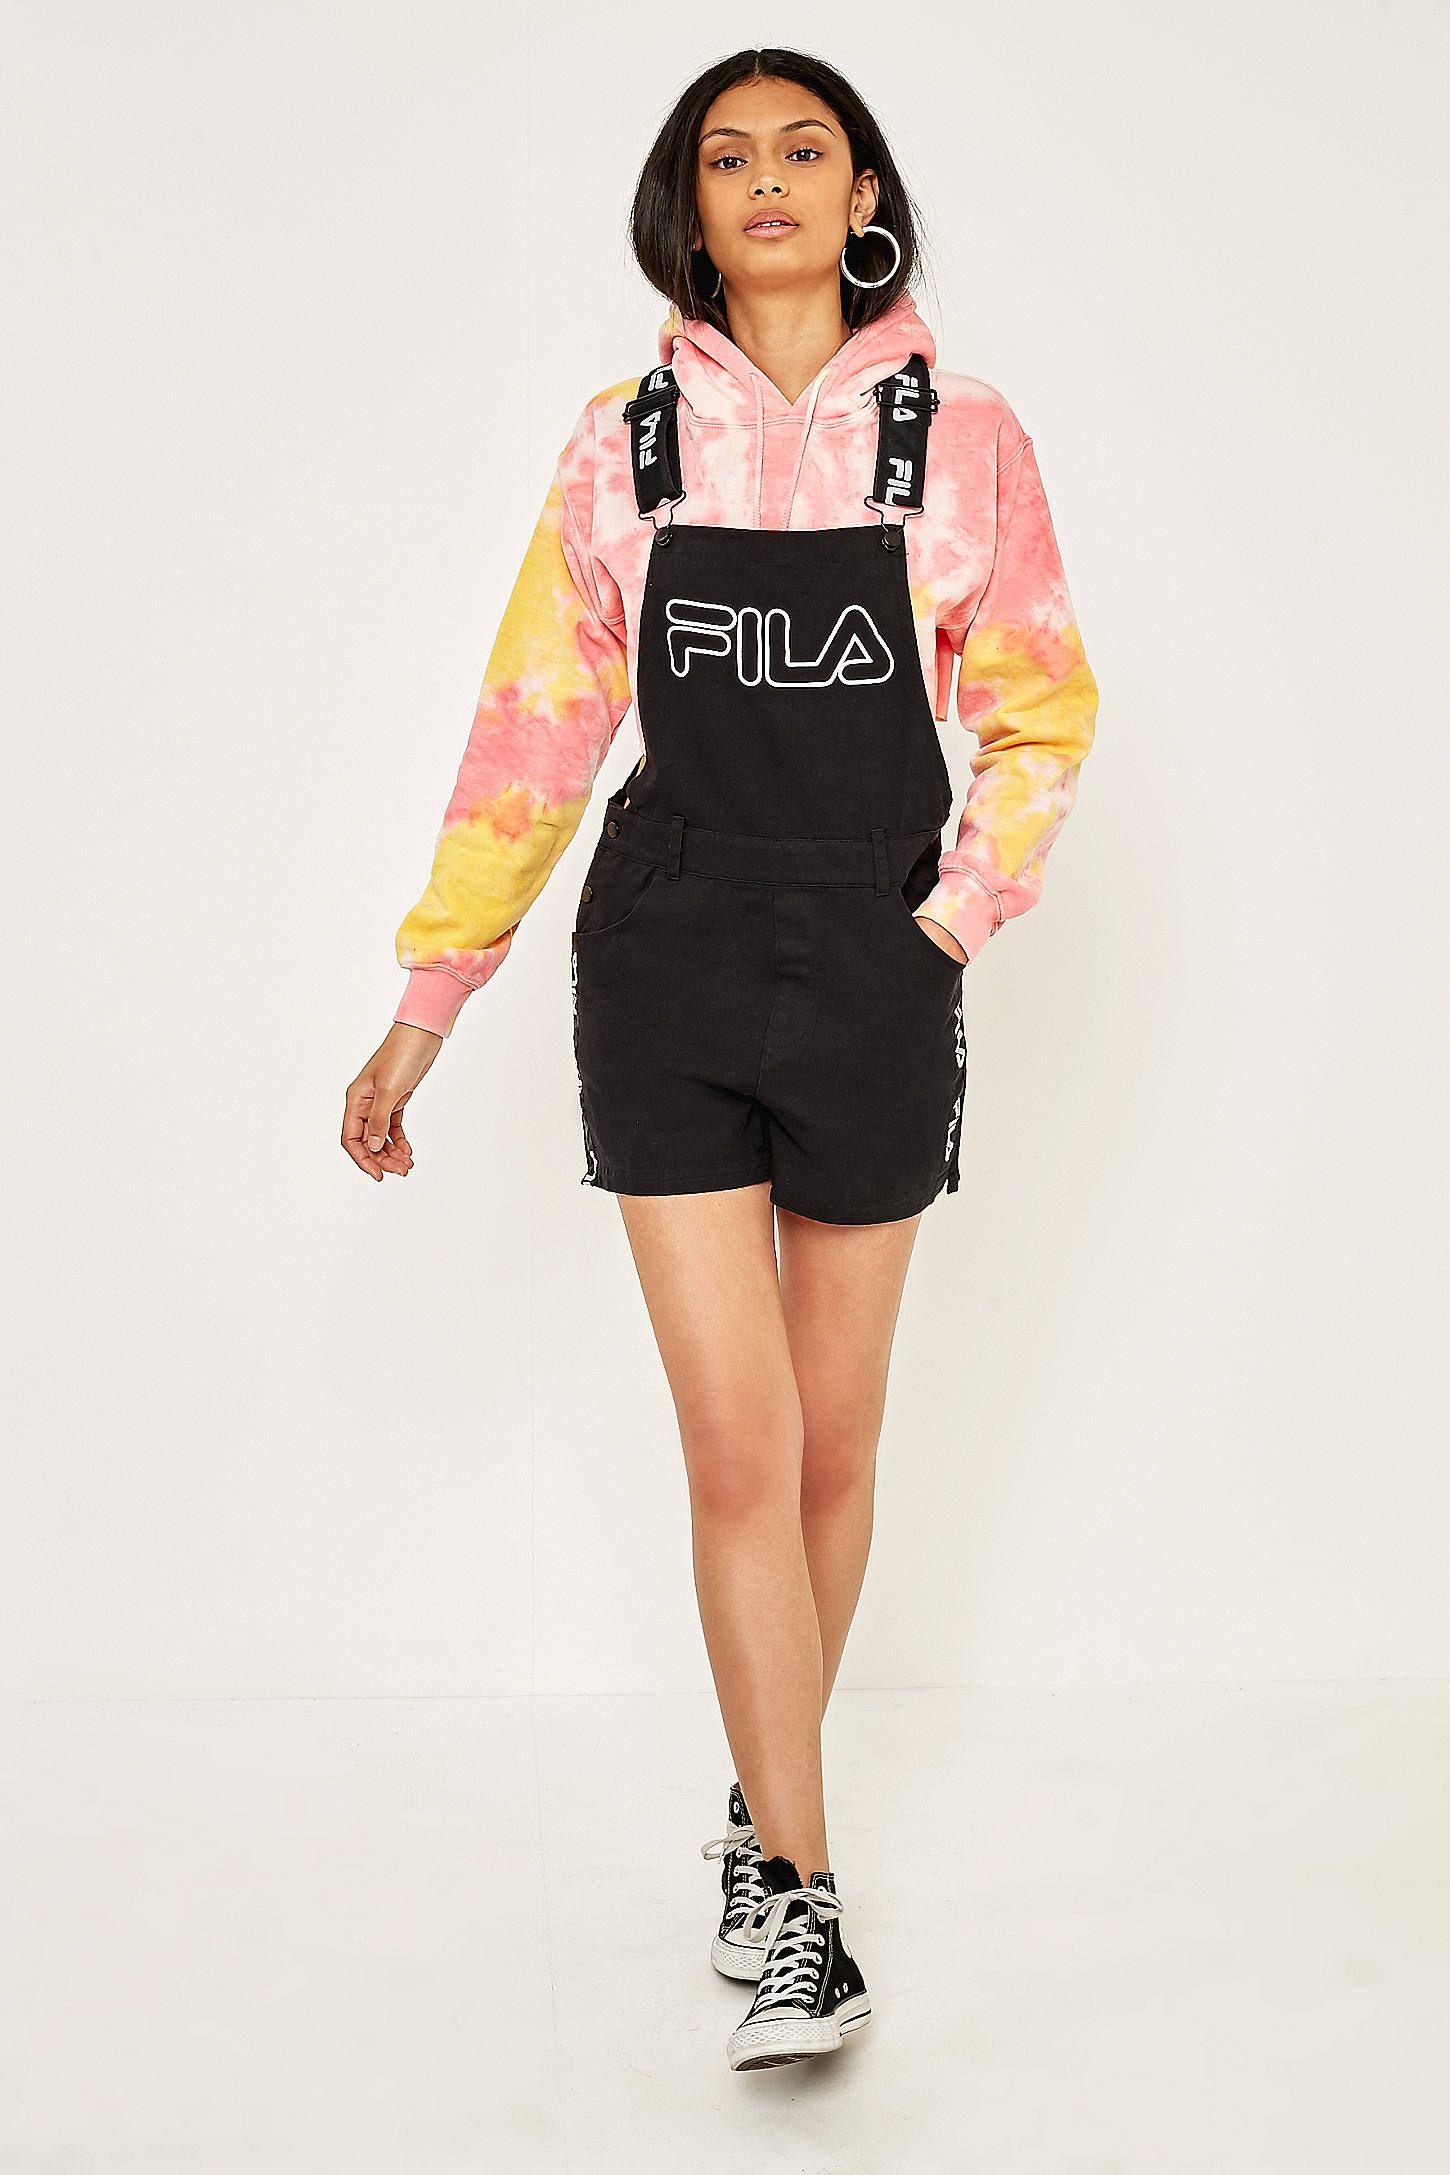 fila shorts overalls